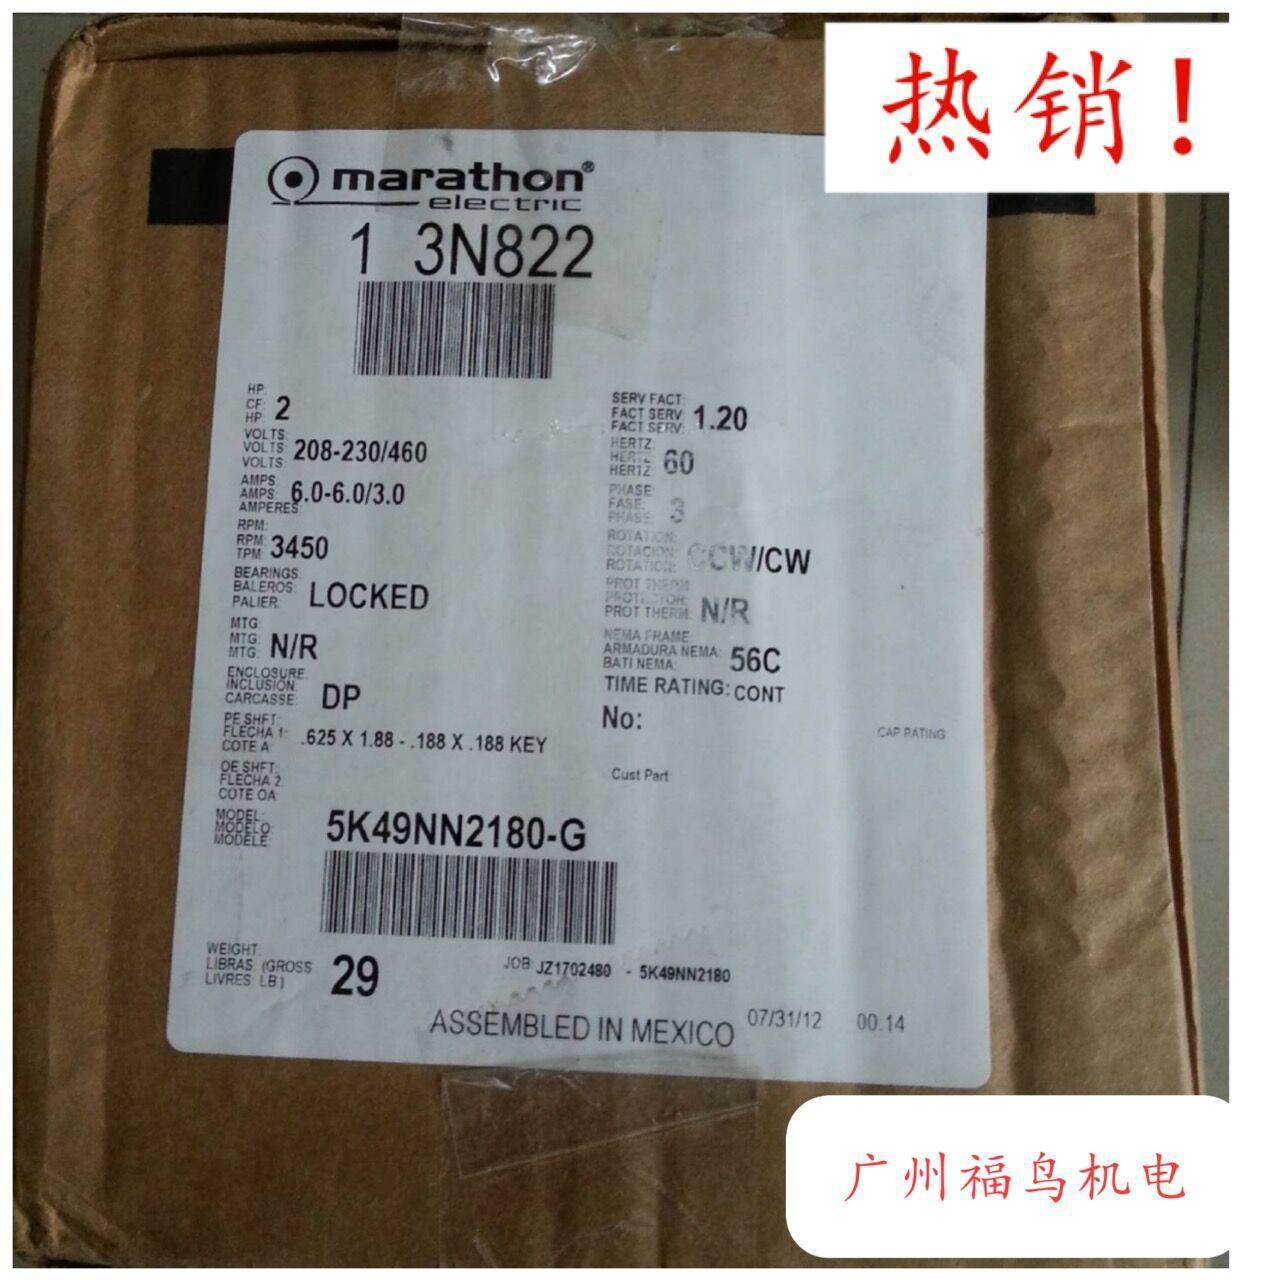 MARATHON電機, 型號: 5K49NN2180